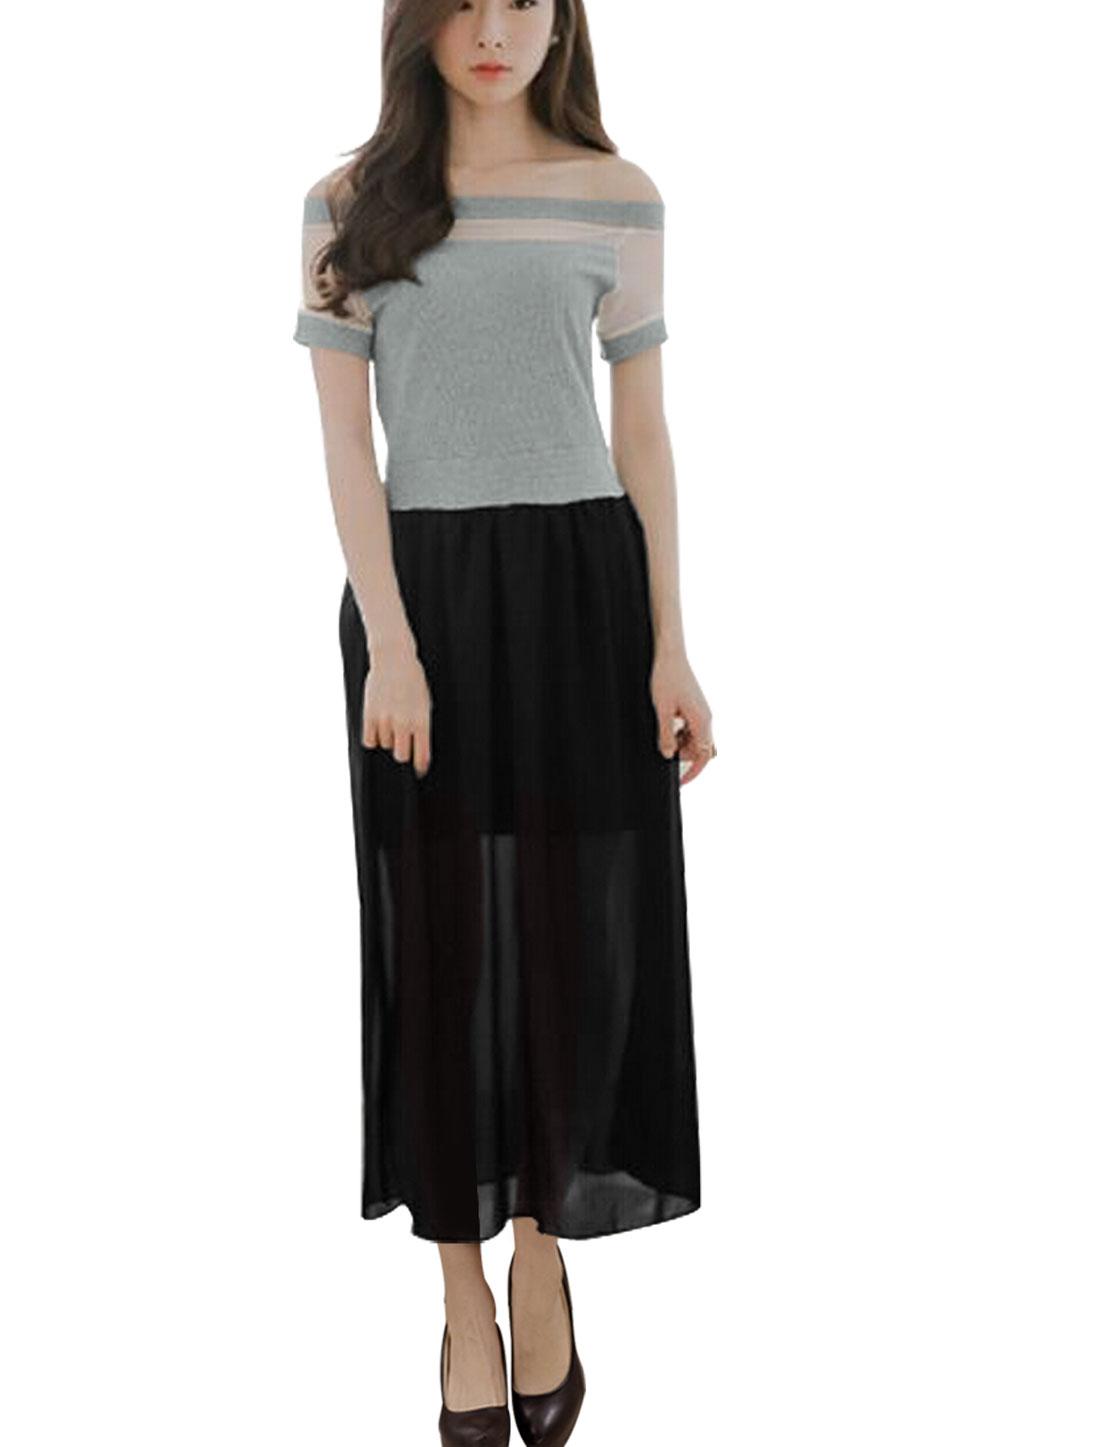 Women Off Shoulder Paneled Design Casual Midi Dress Black Light Gray M